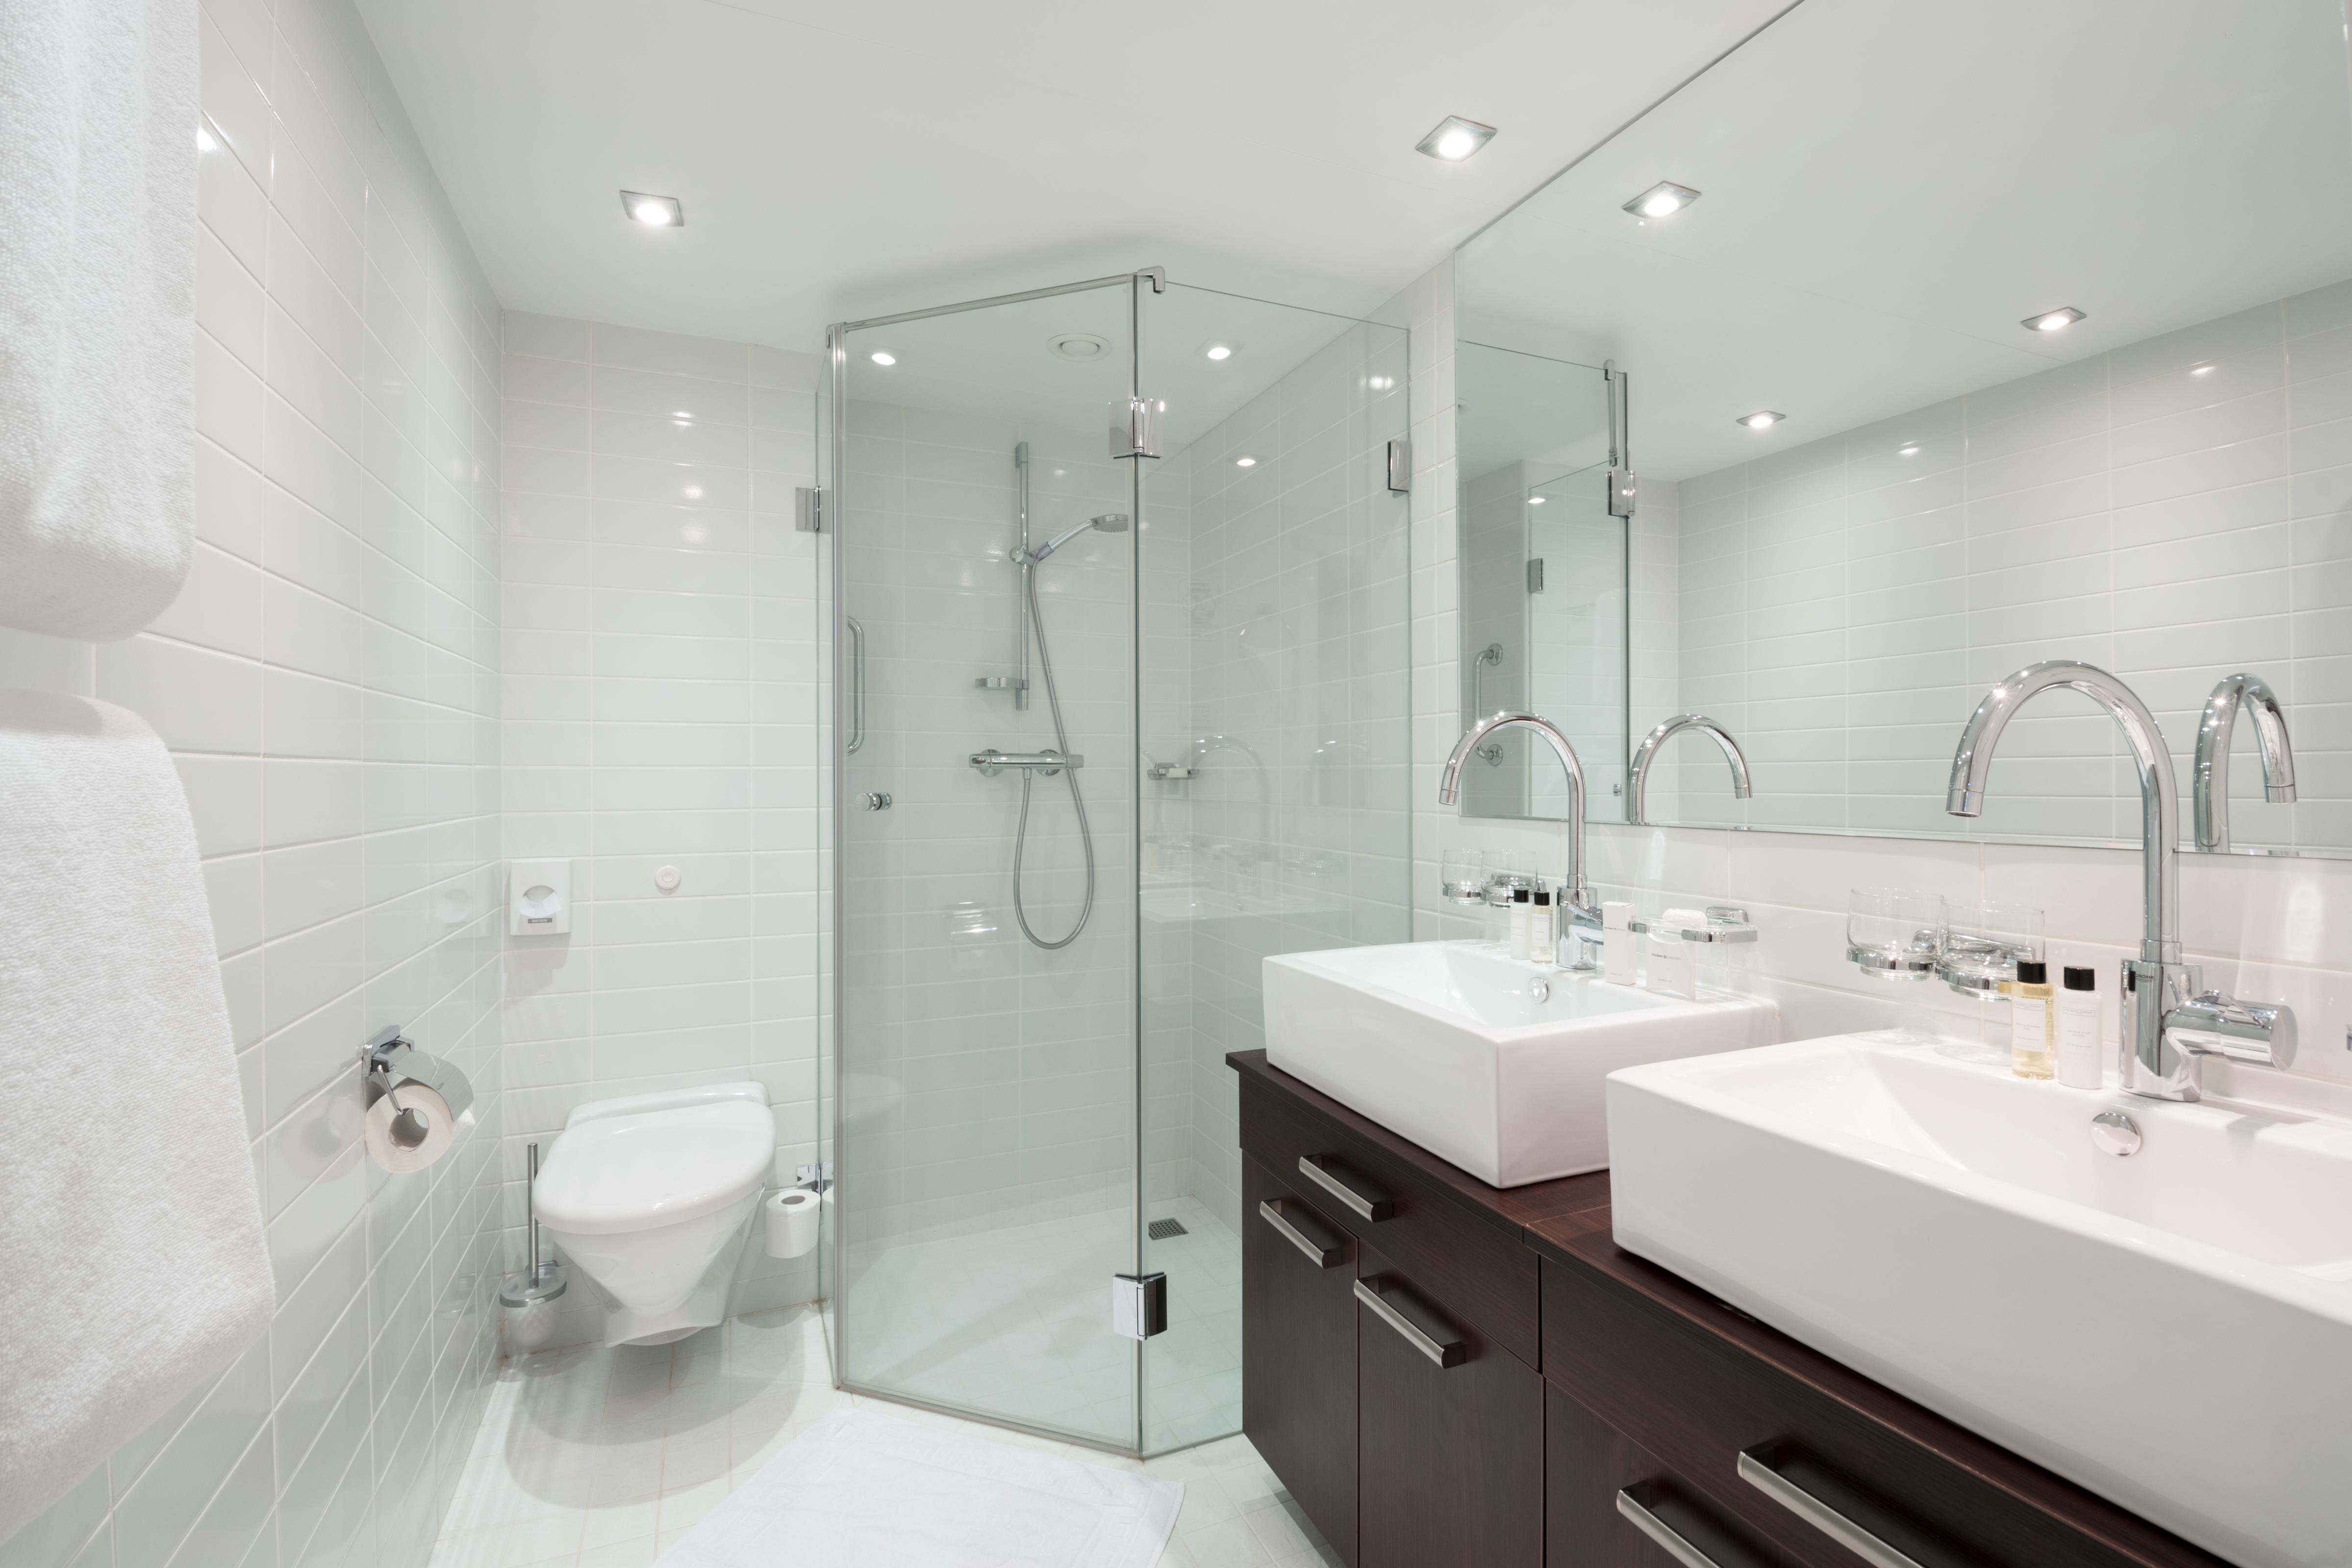 Scenic Tsar Accommodation Royal Panorama Suite Bathroom 1.jpg